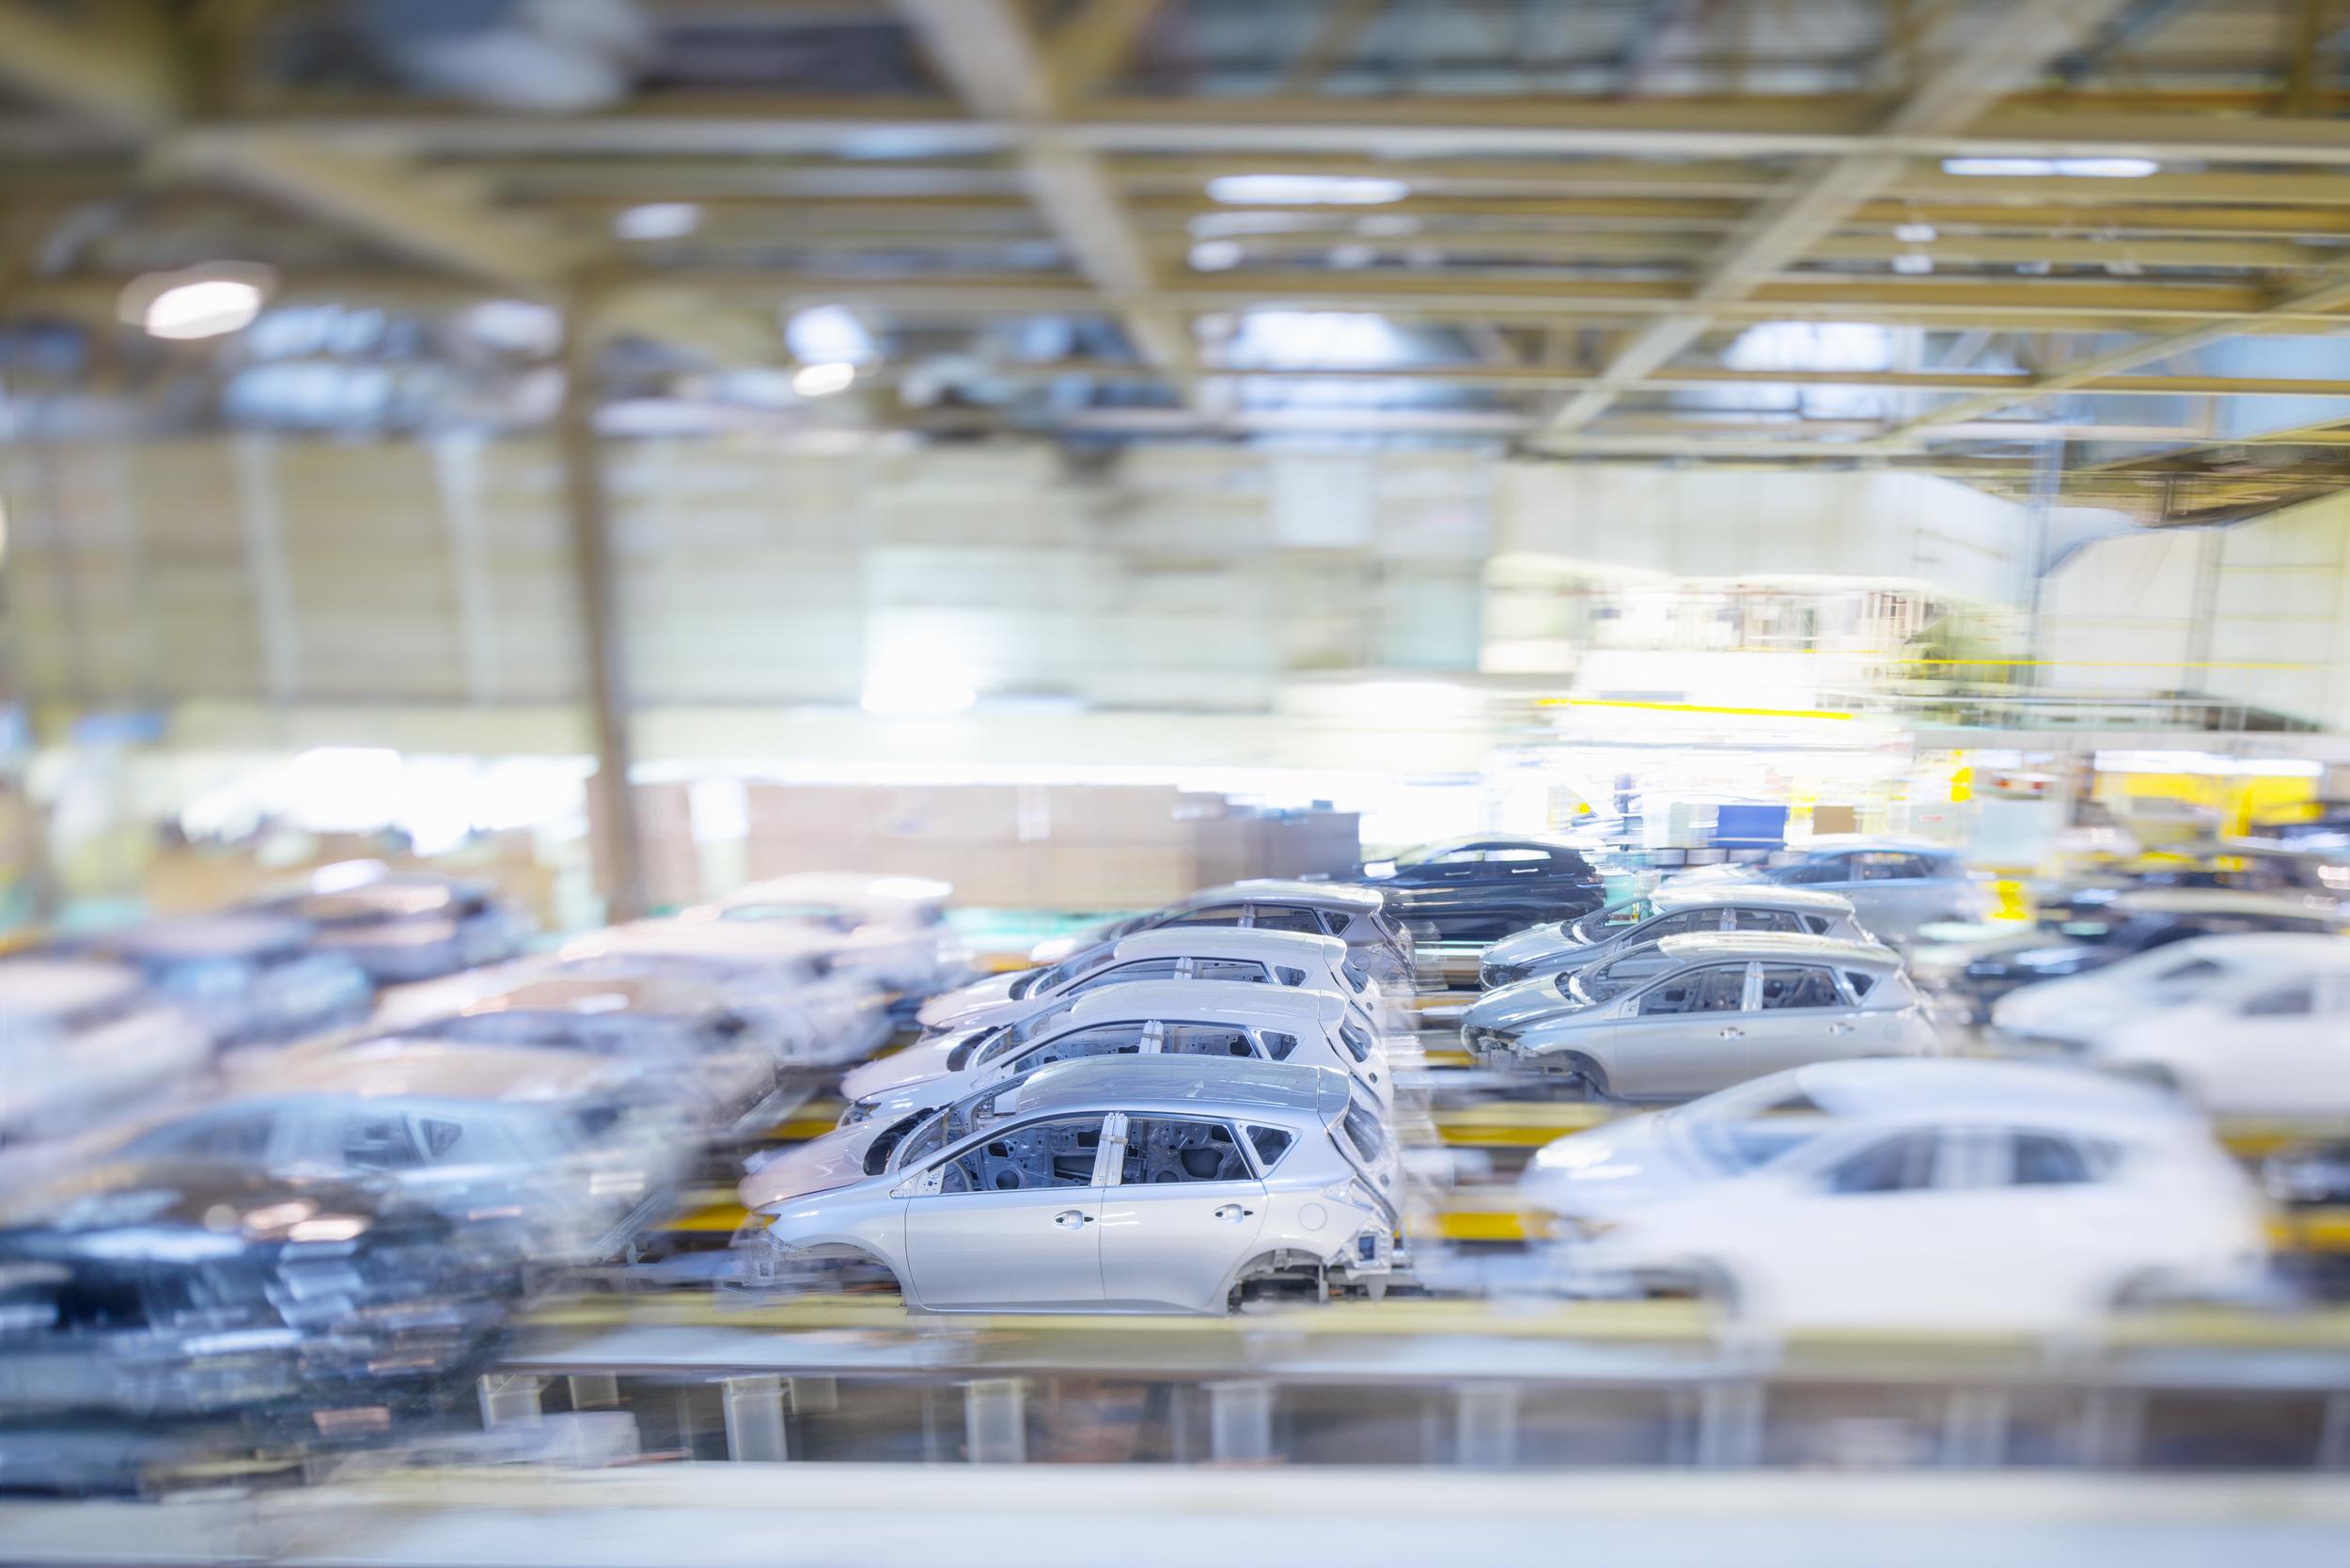 Inside Toyota's Derbyshire factory based in Burnaston.